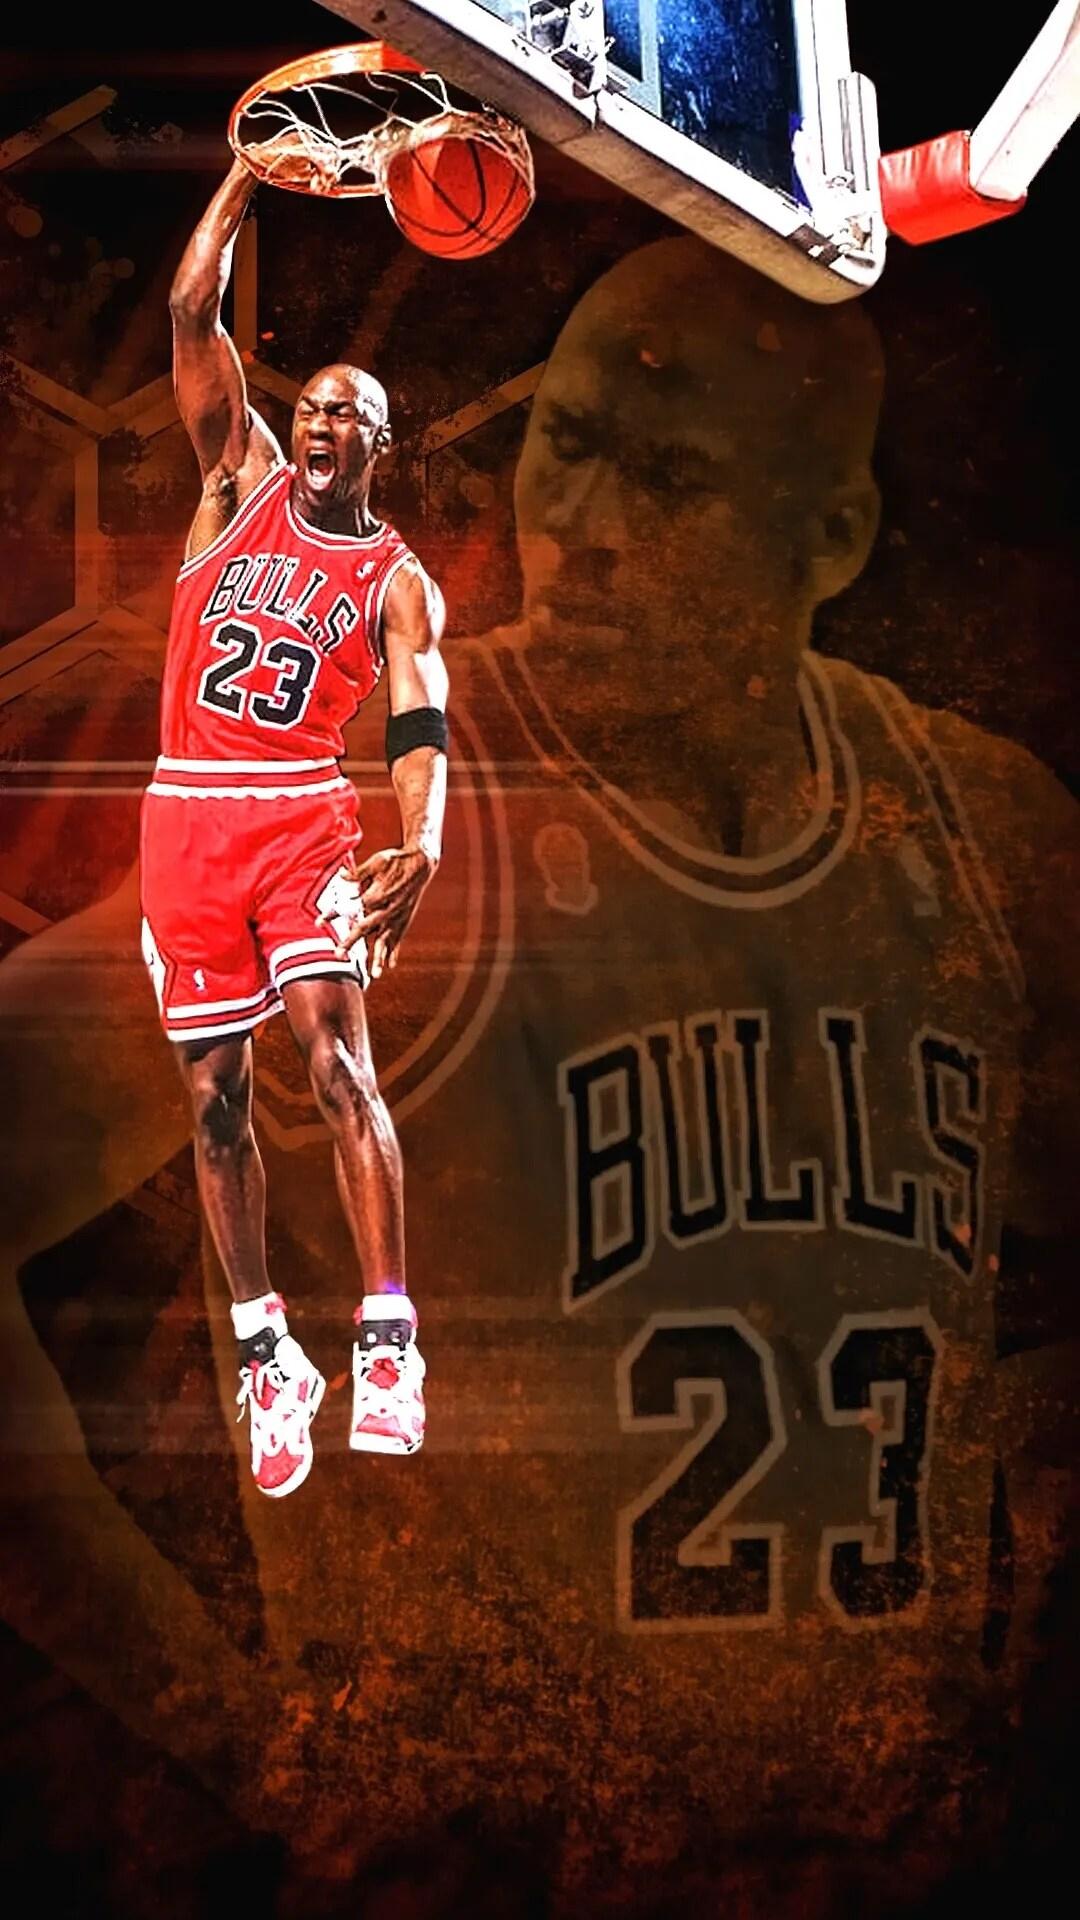 iPhone wallpaper michael jordan3 Michael Jordan